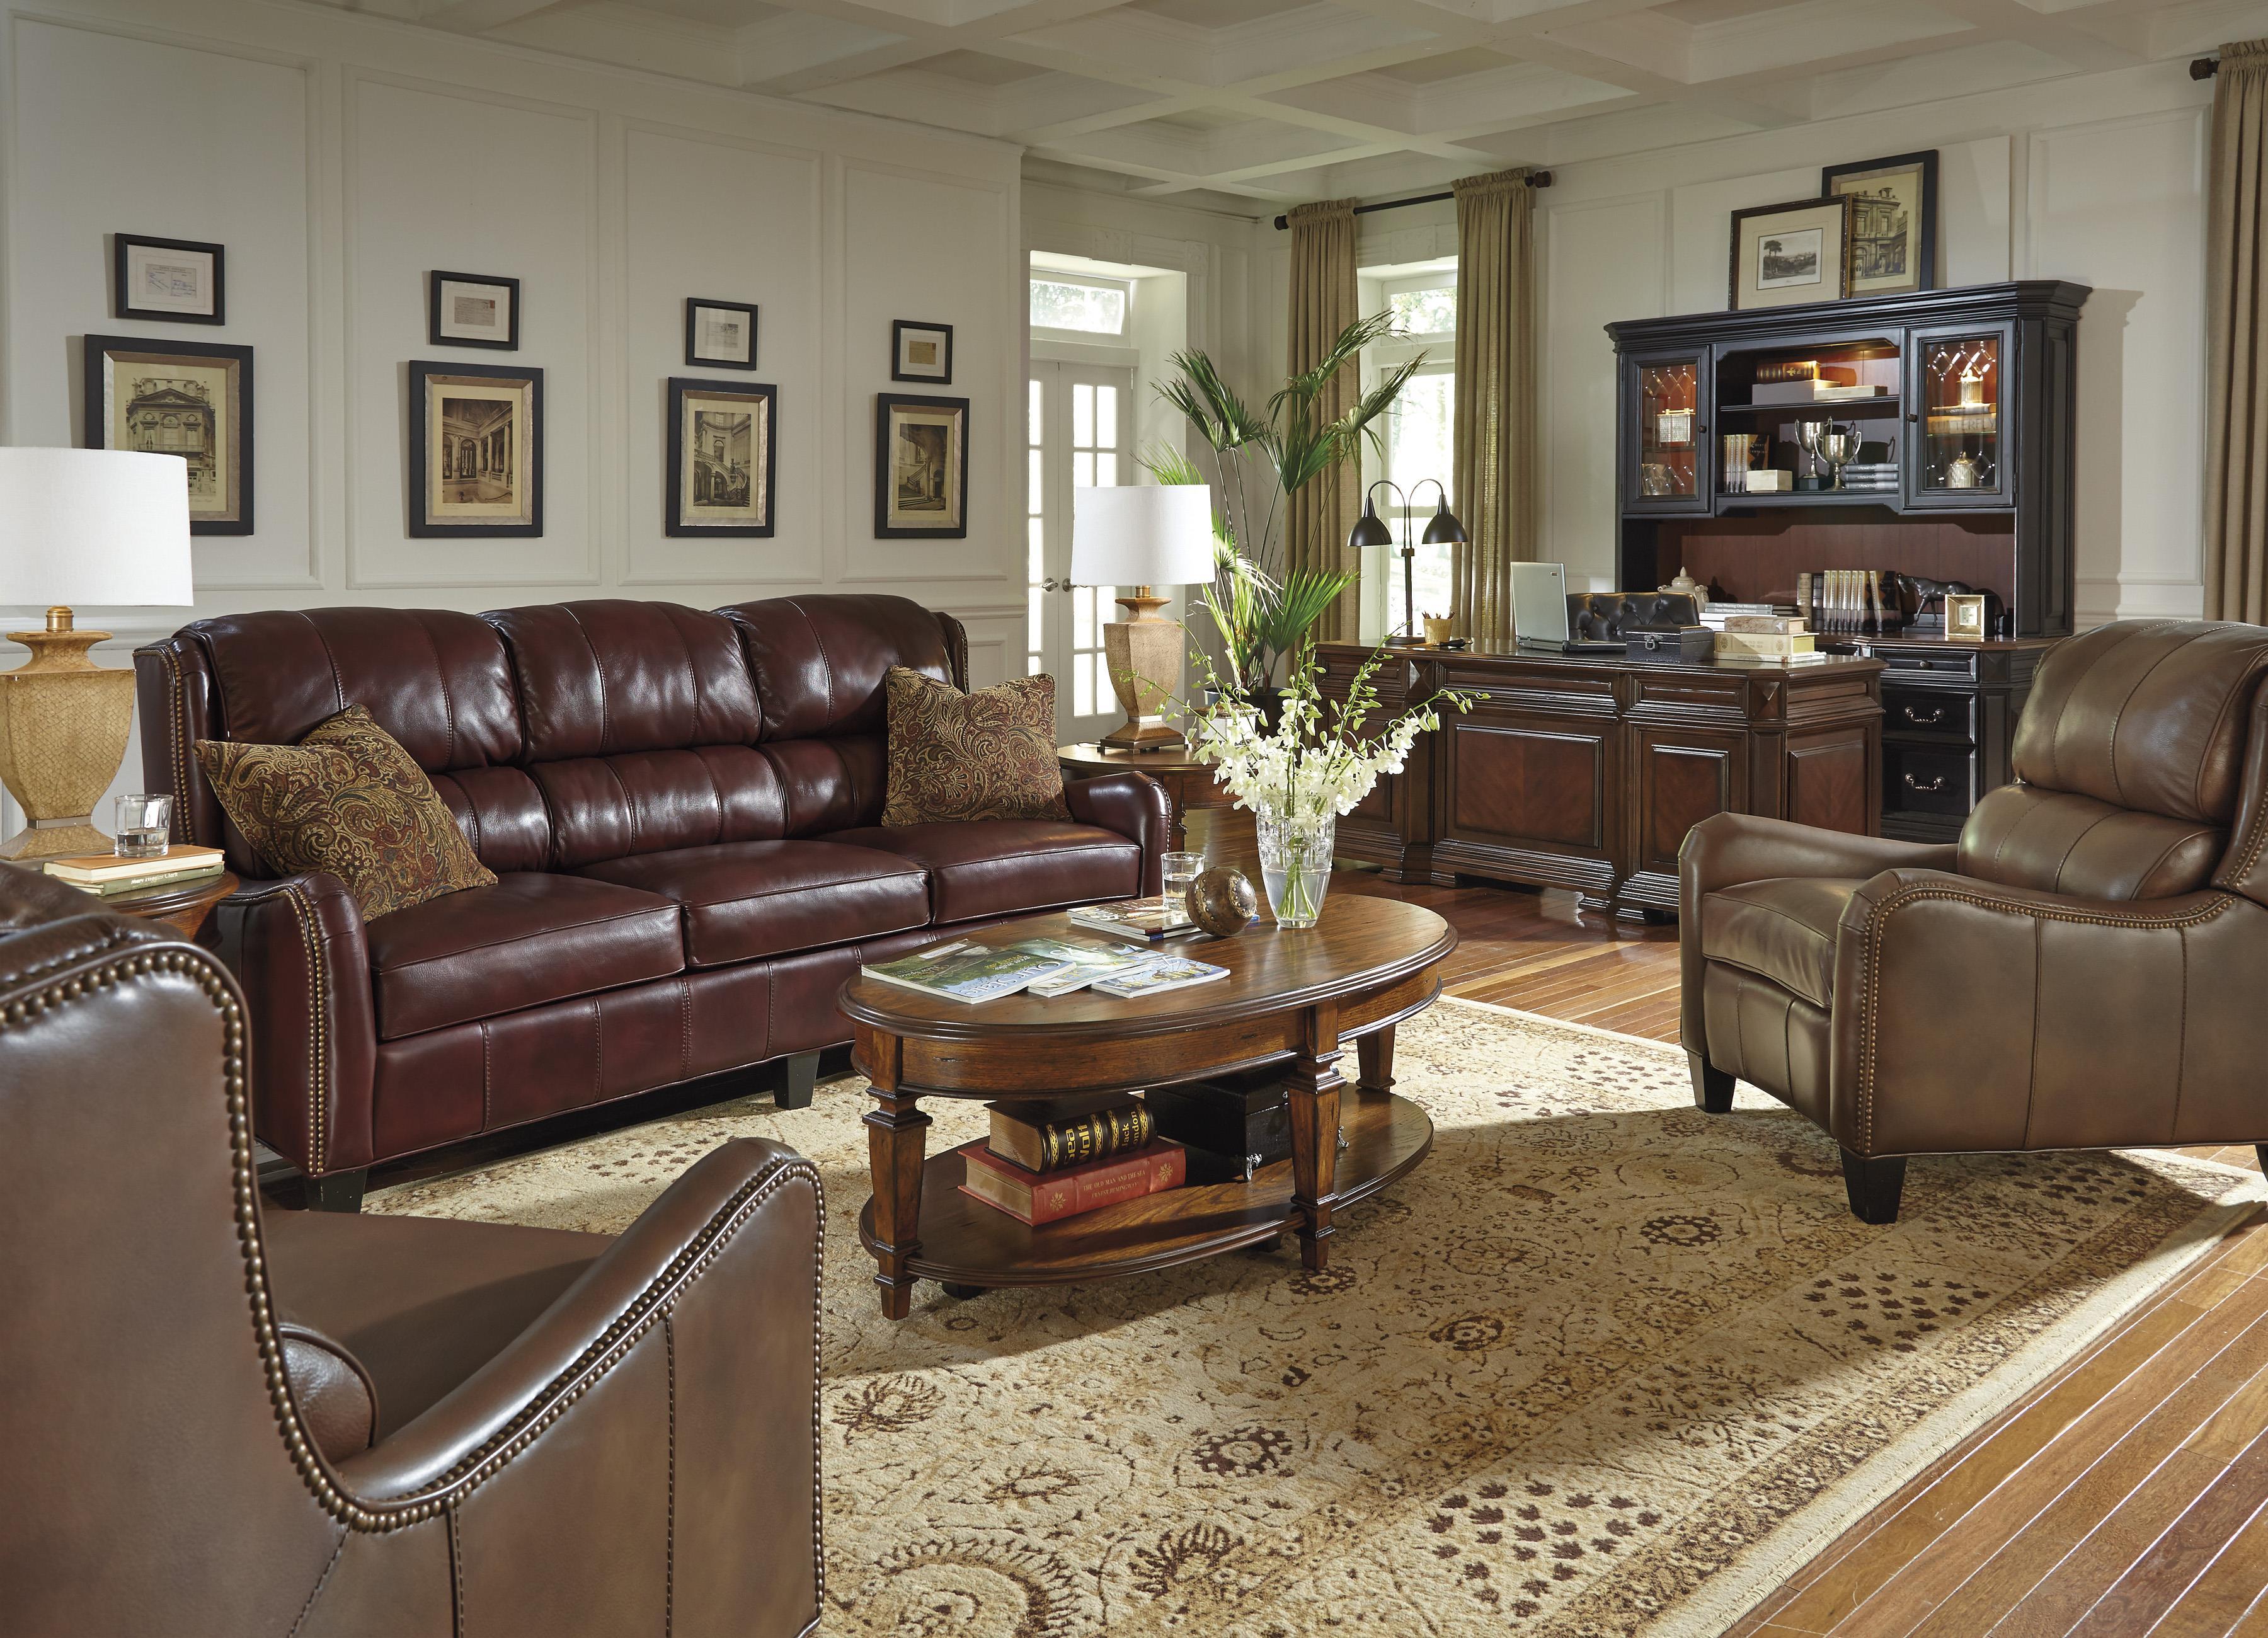 Flexsteel Latitudes-Lukas Stationary Living Room Group - Item Number: 1136 Living Room Group 1